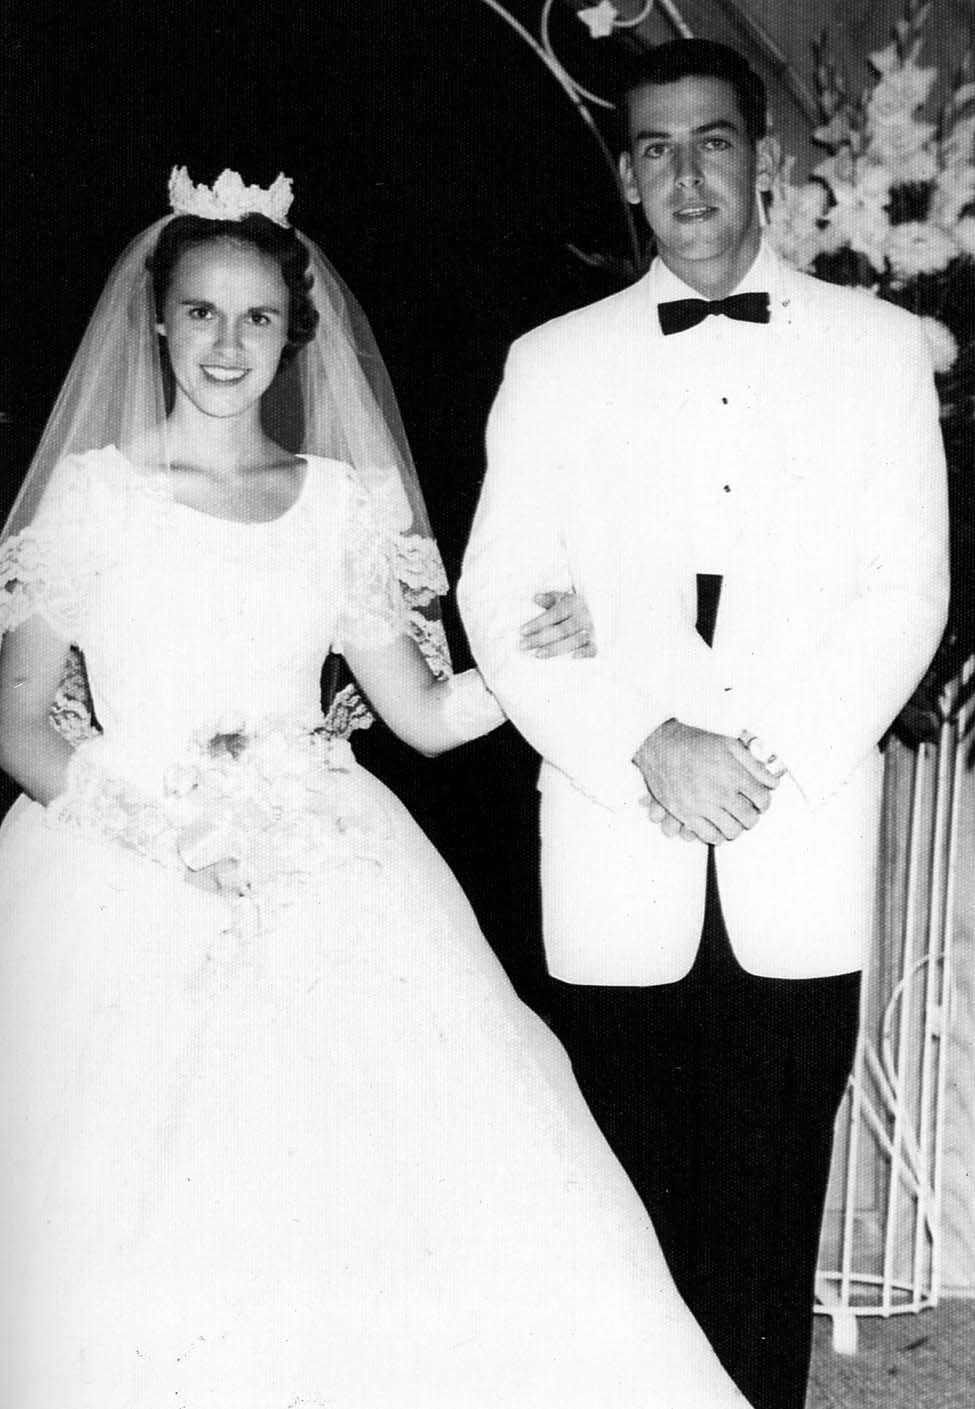 60 YEARS AGO.....MARSH AND PAT LYALL